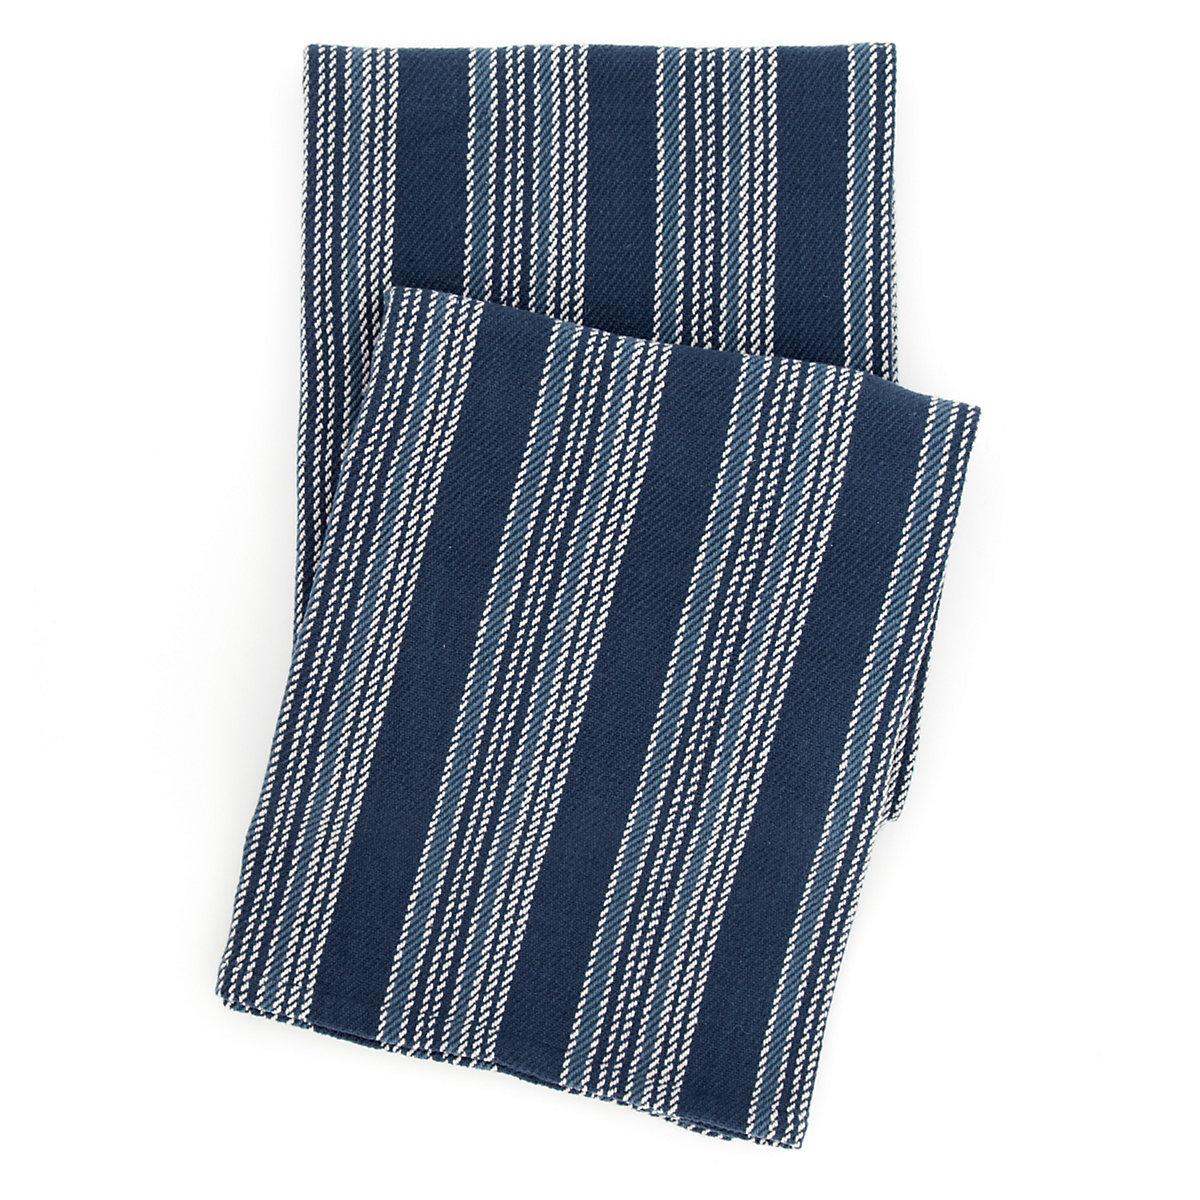 Cameroon woven cotton throw dash albert for Dash and albert blanket